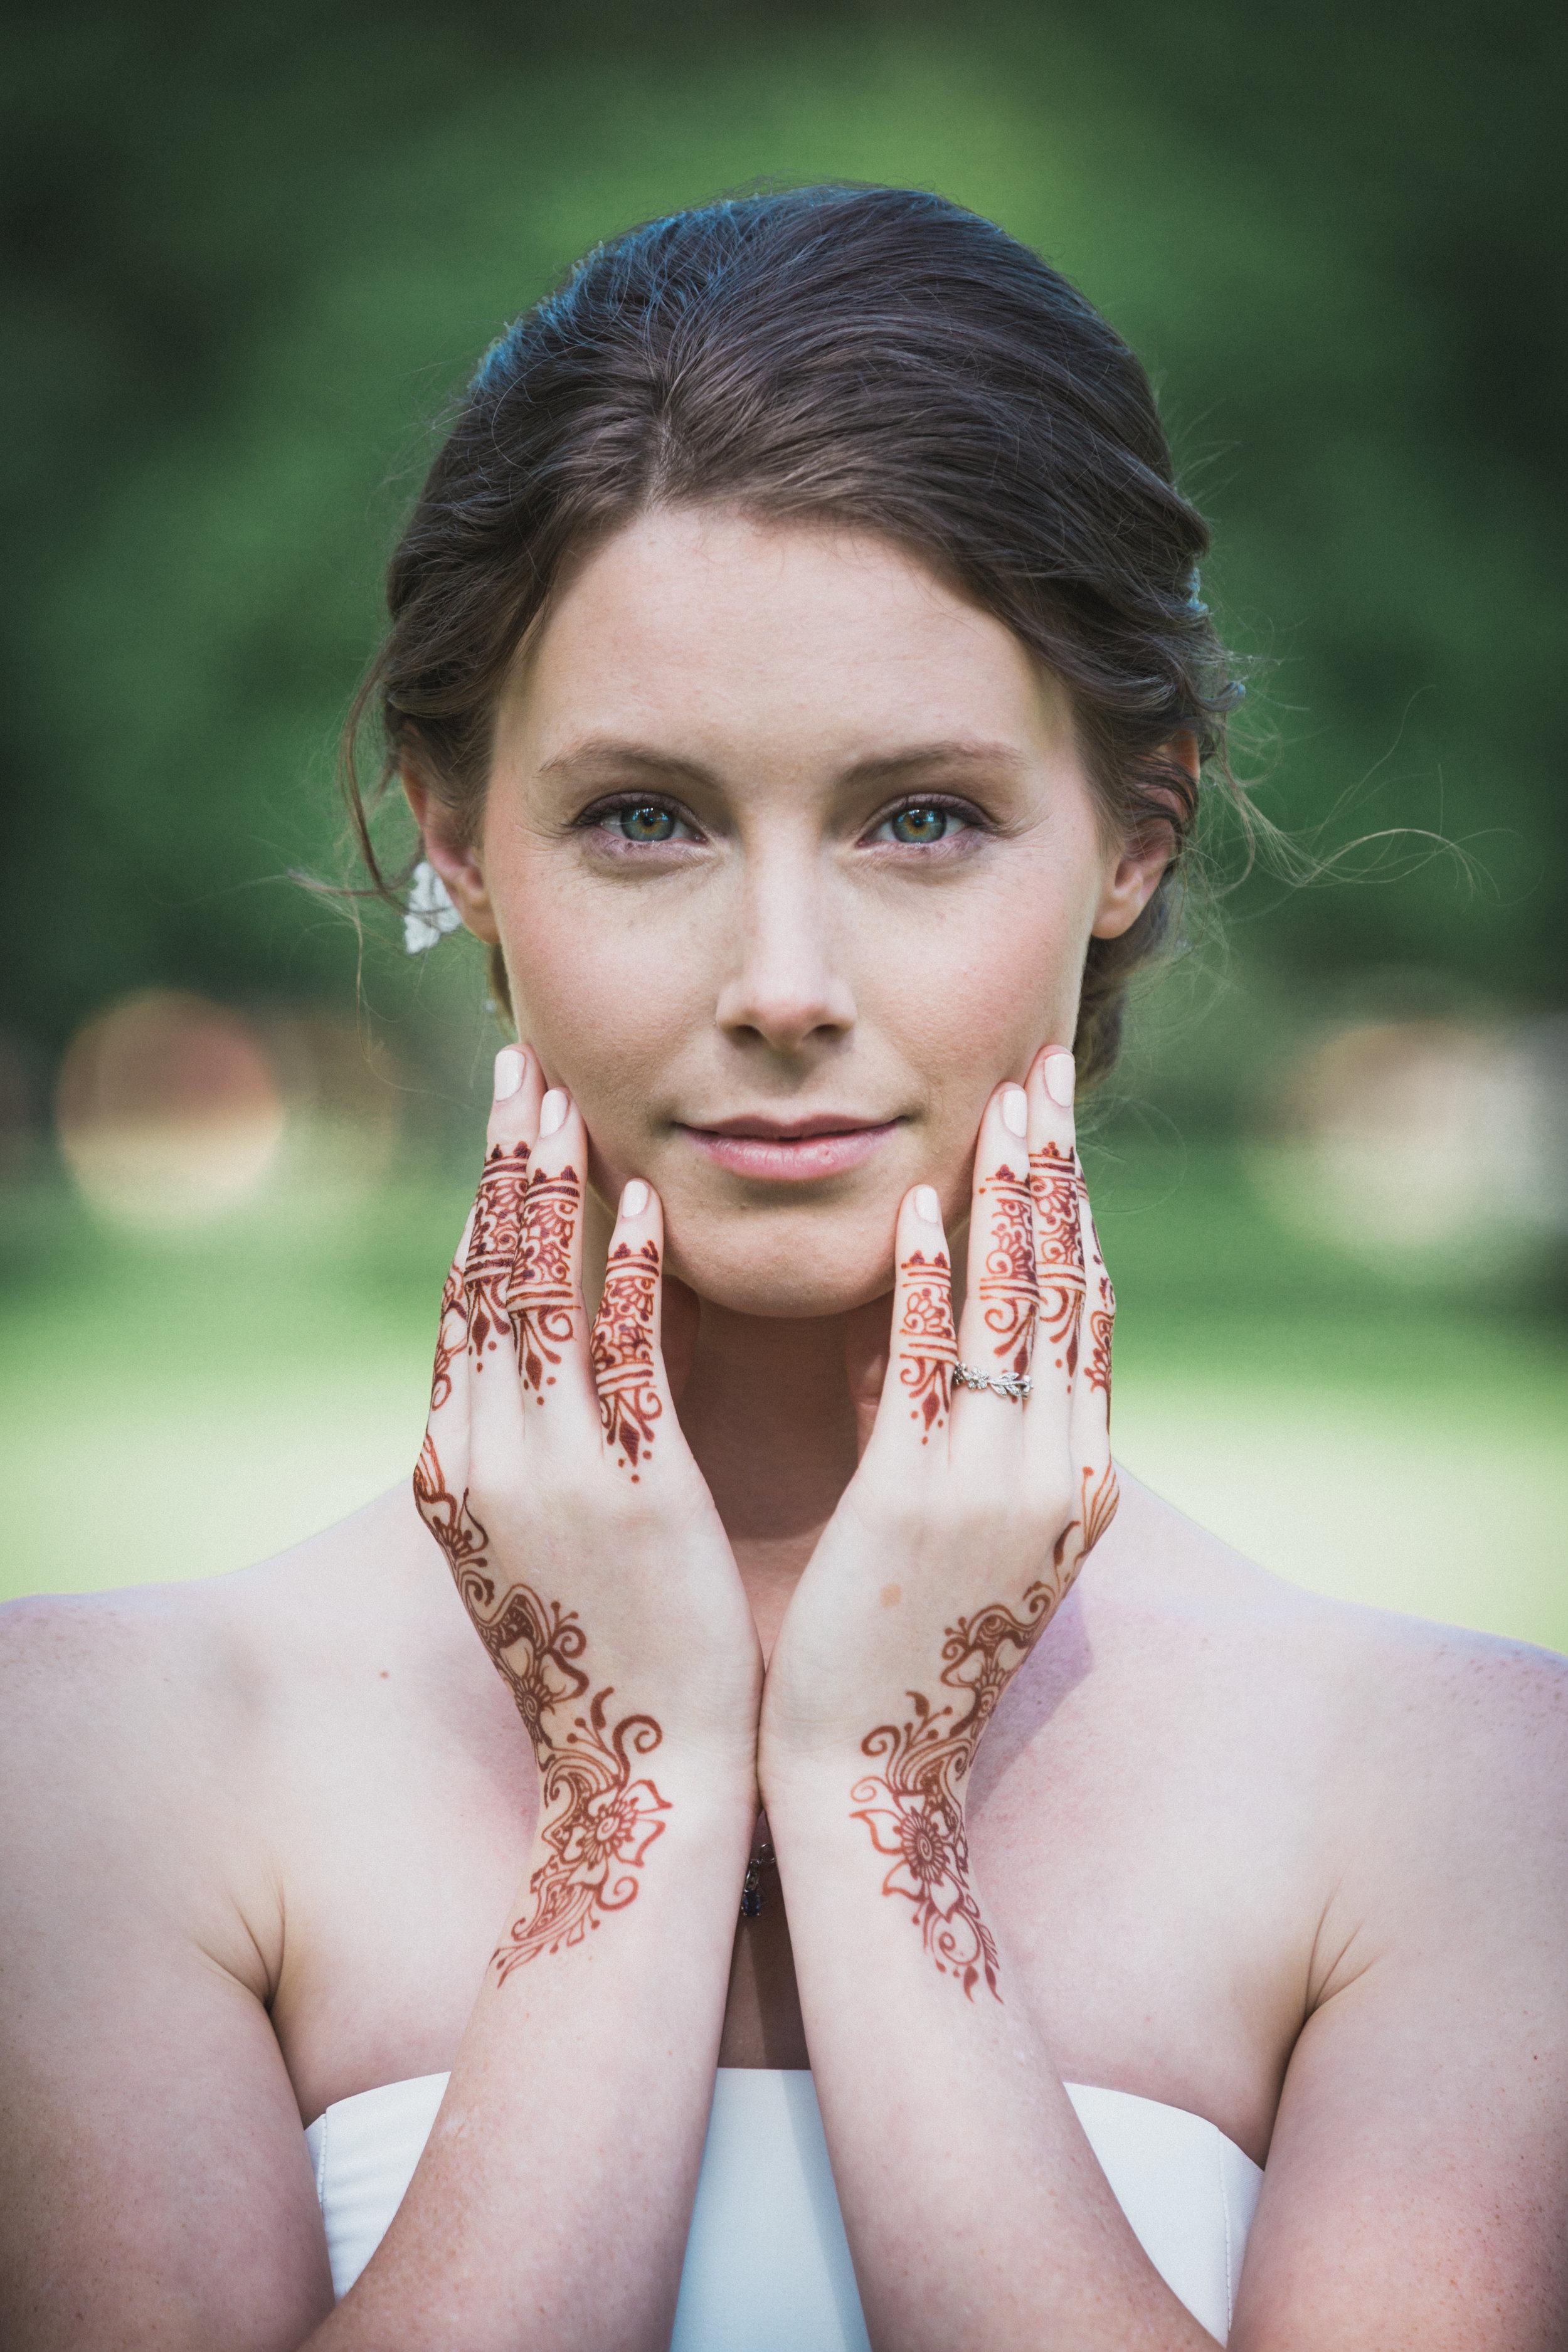 Chicago Bride with Henna, Lane Tech High School, Chicago Wedding Photography - Amy Stallard Photography